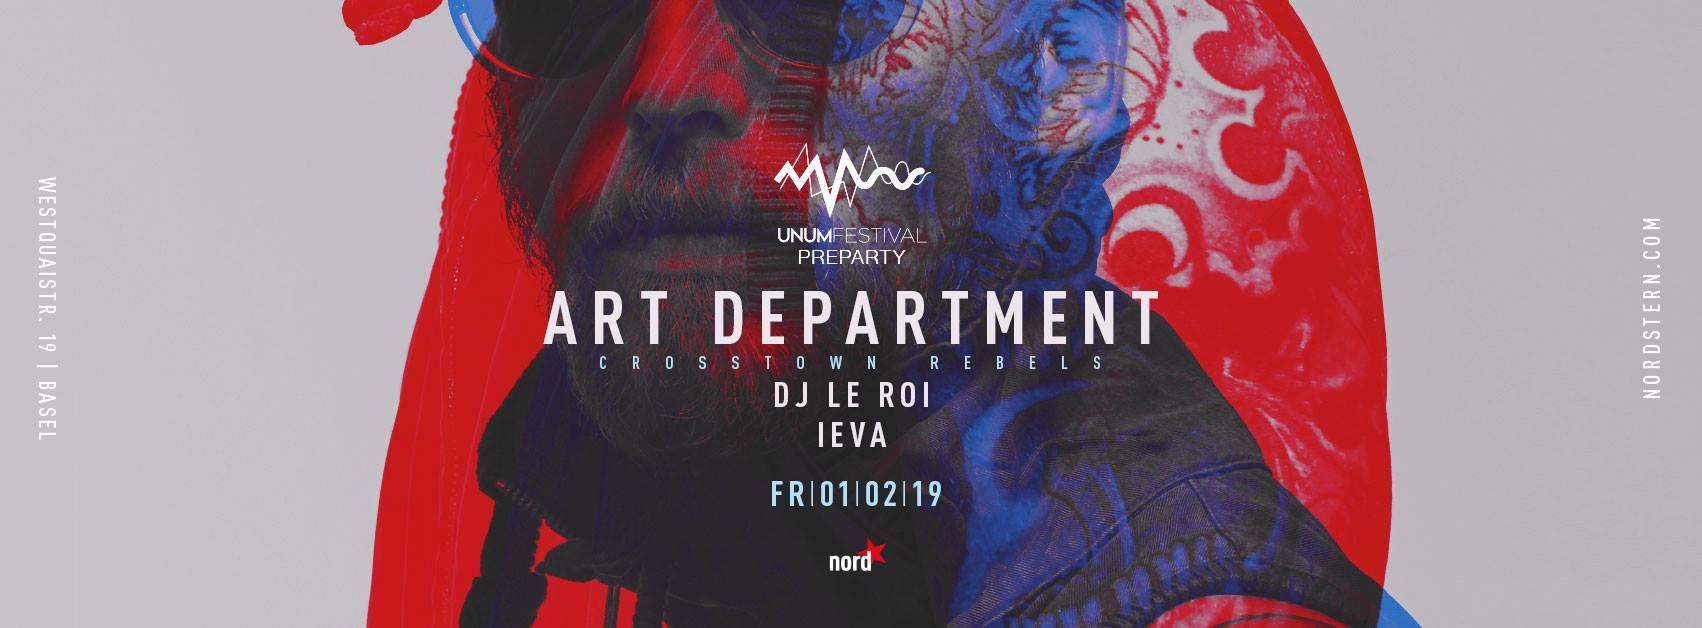 UNUM Pre-Party in Basel w/ Art Department, DJ Le Roi & Ieva